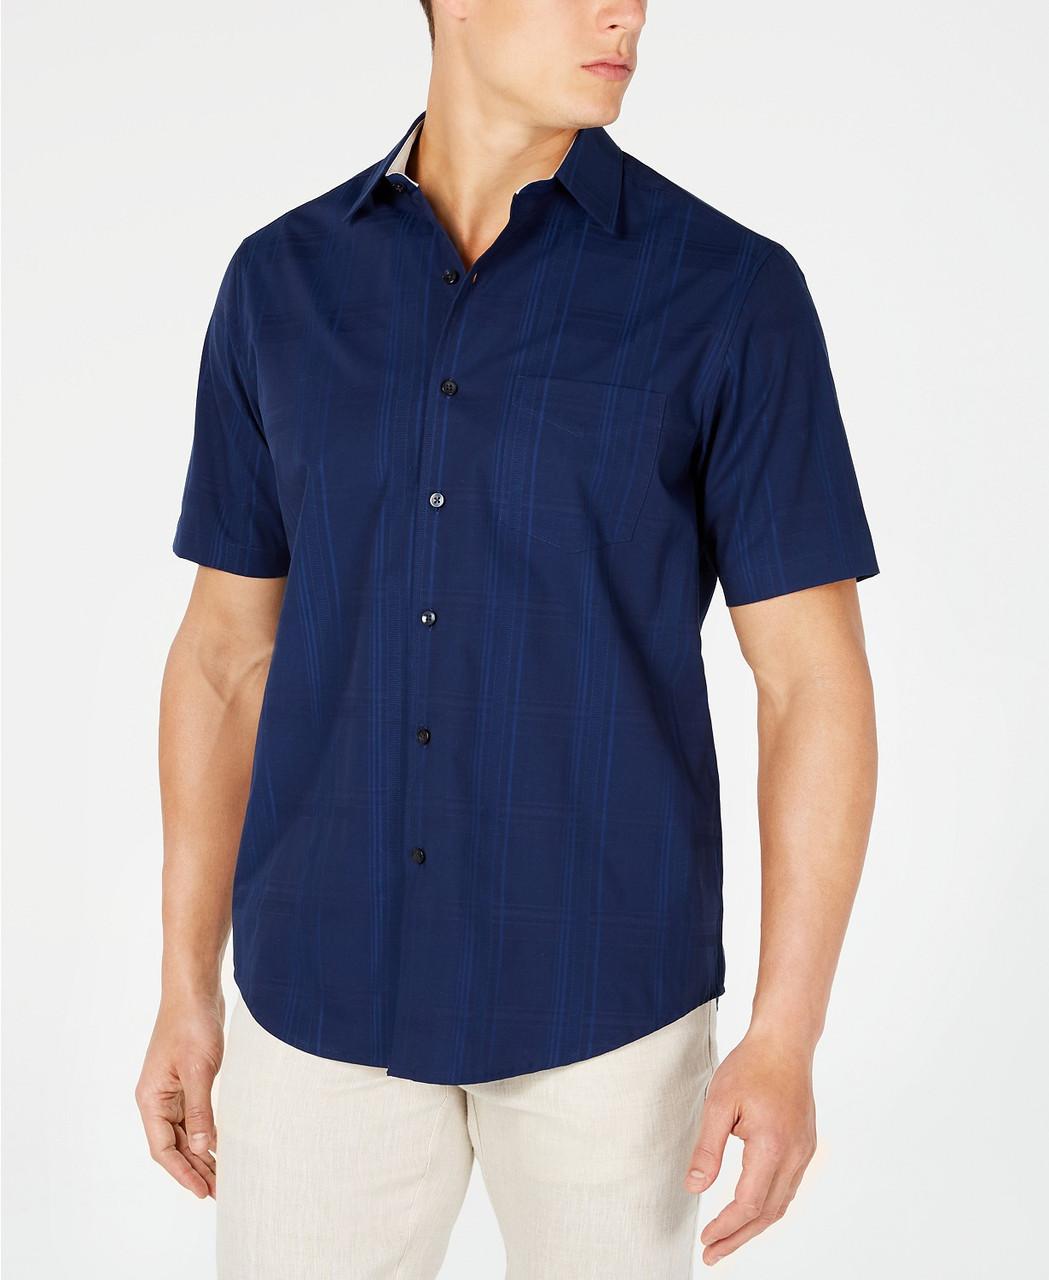 Tasso Elba Мужская рубашка - Е2